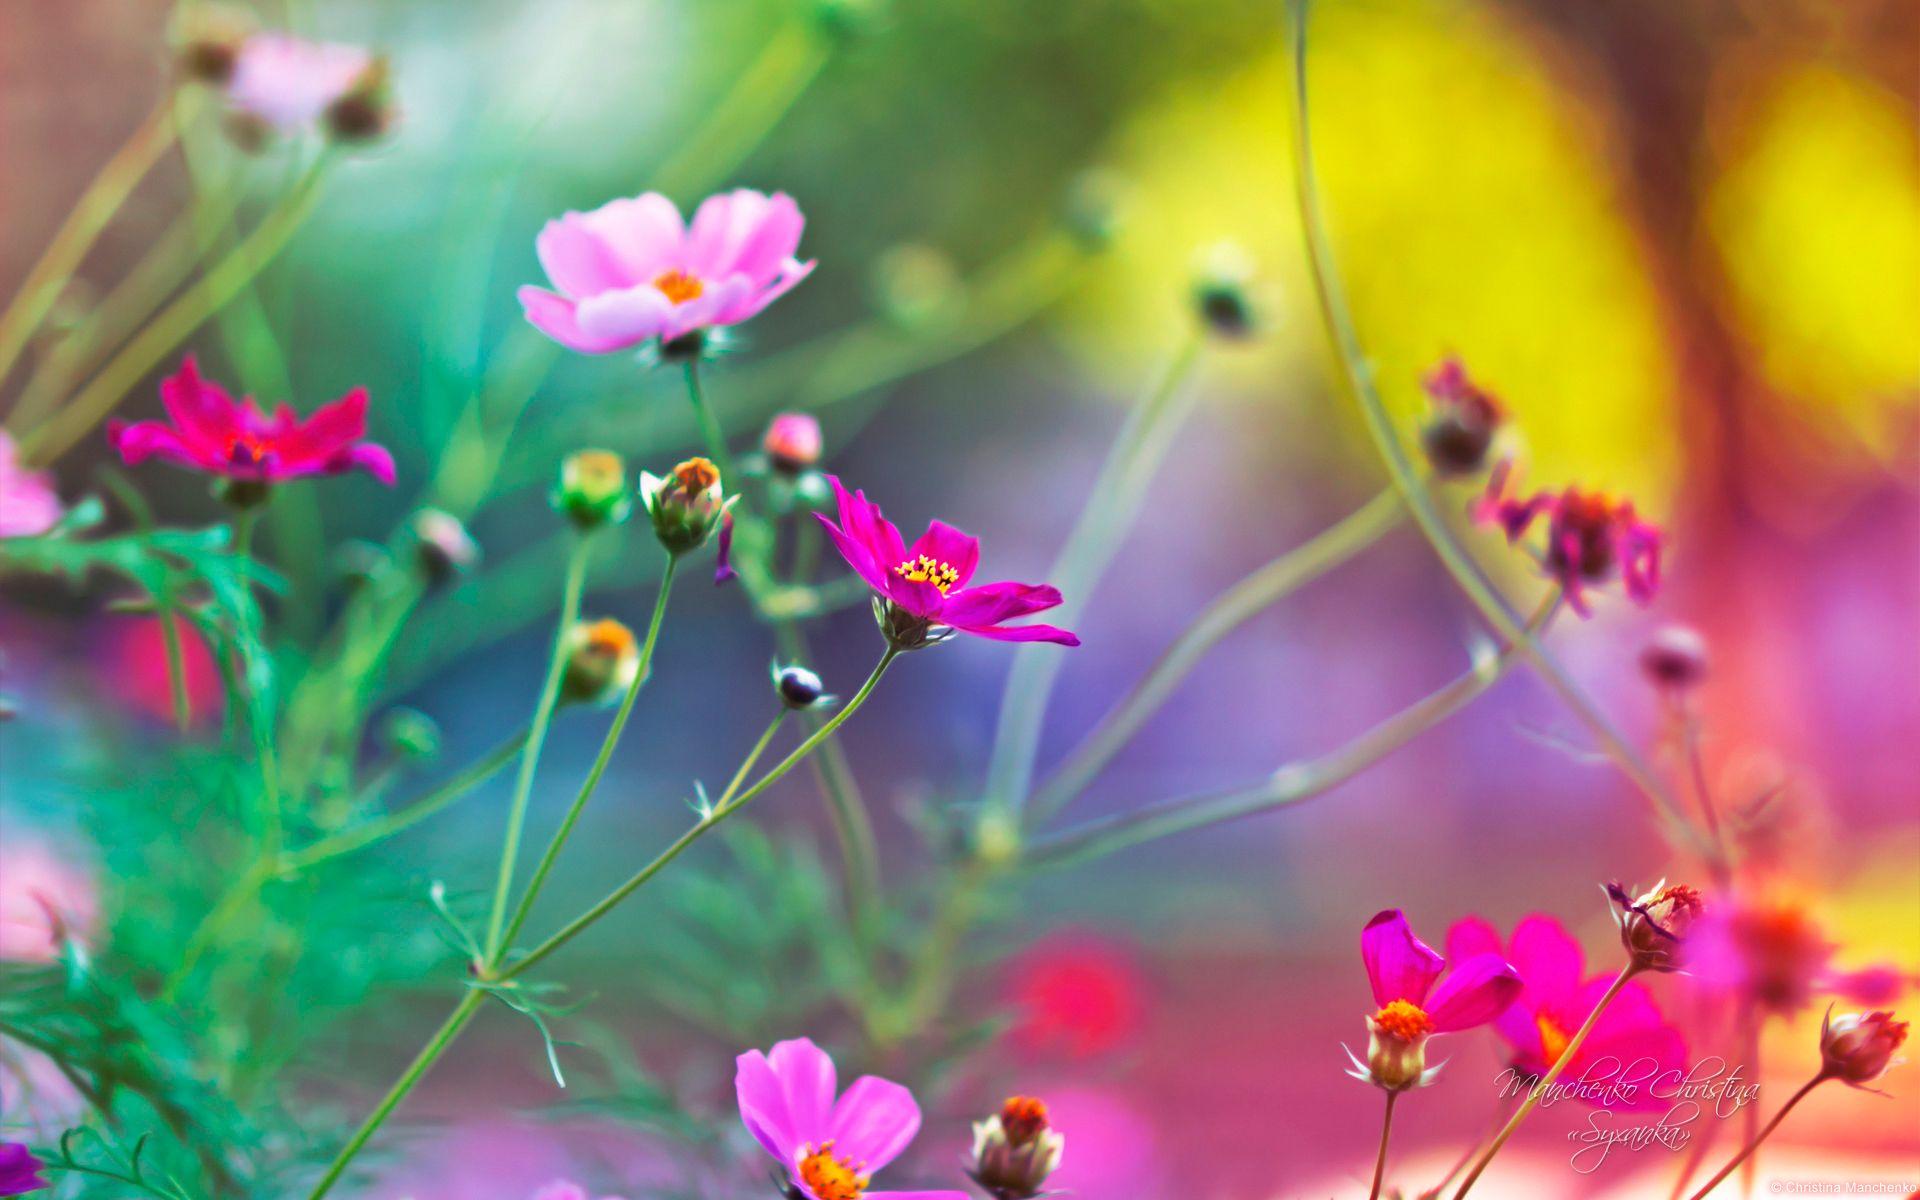 an excellent flower wallpaper for windows hd wallpapers 1680×1050